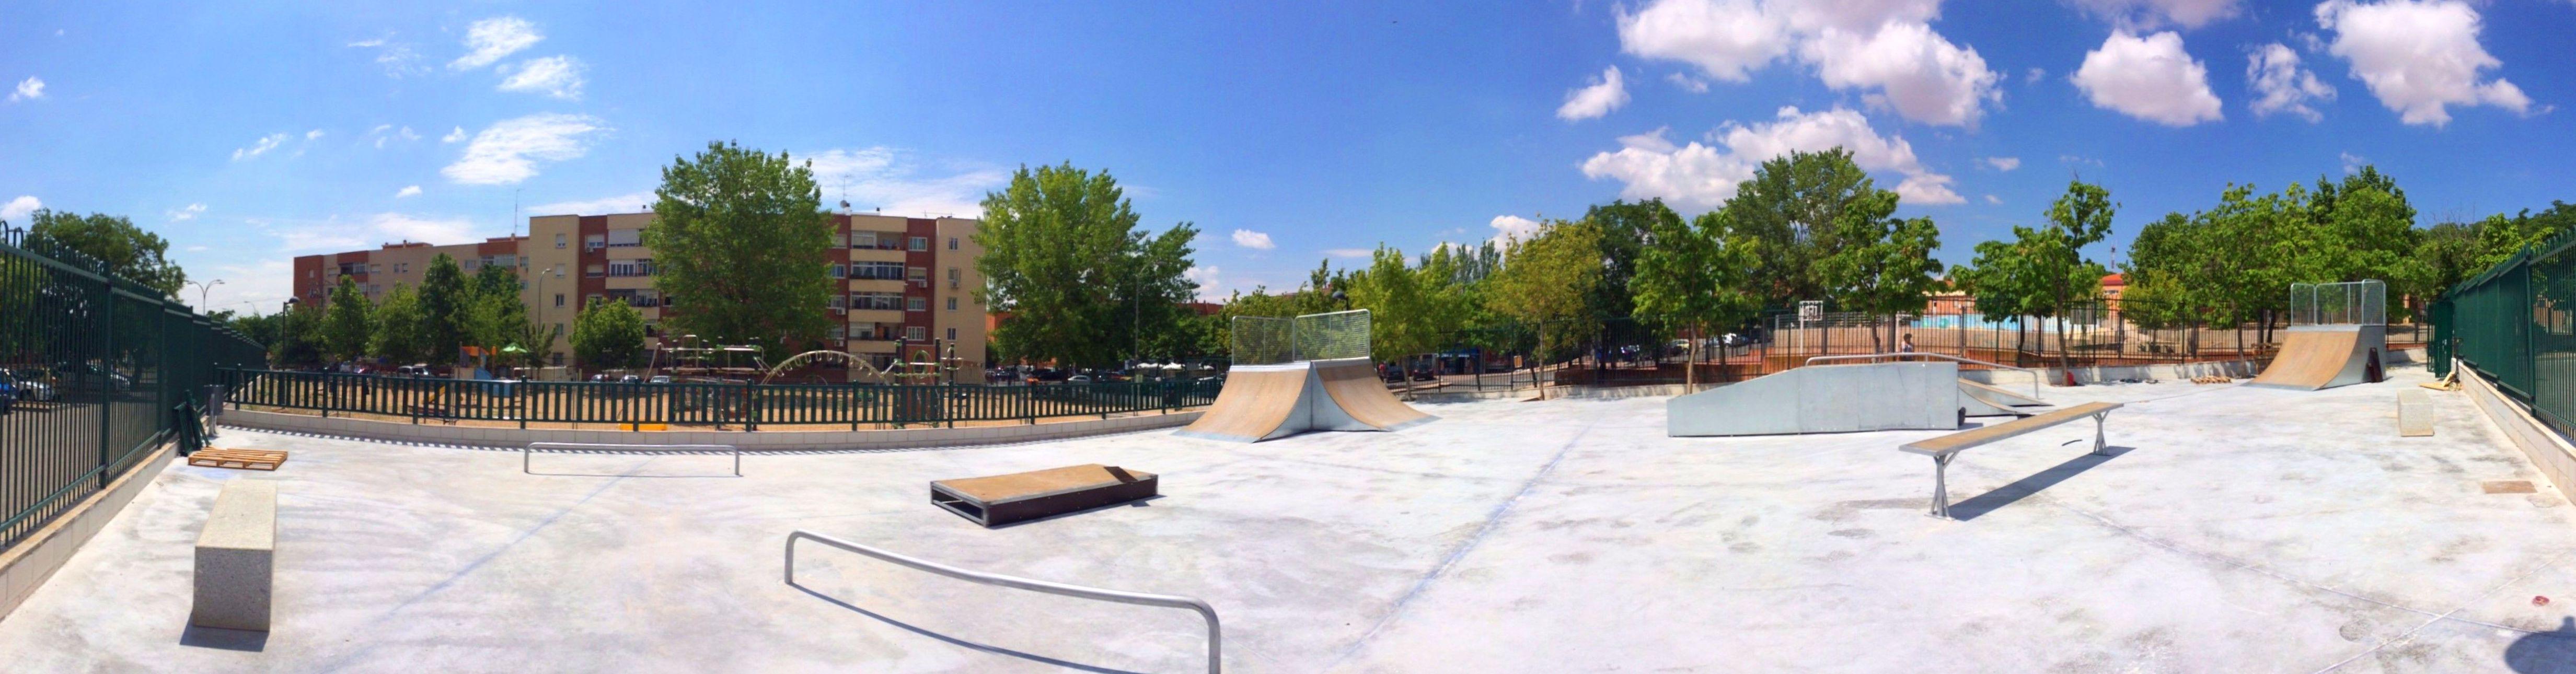 Foto 12 de Skate en Amorebieta | Transformers Skateparks